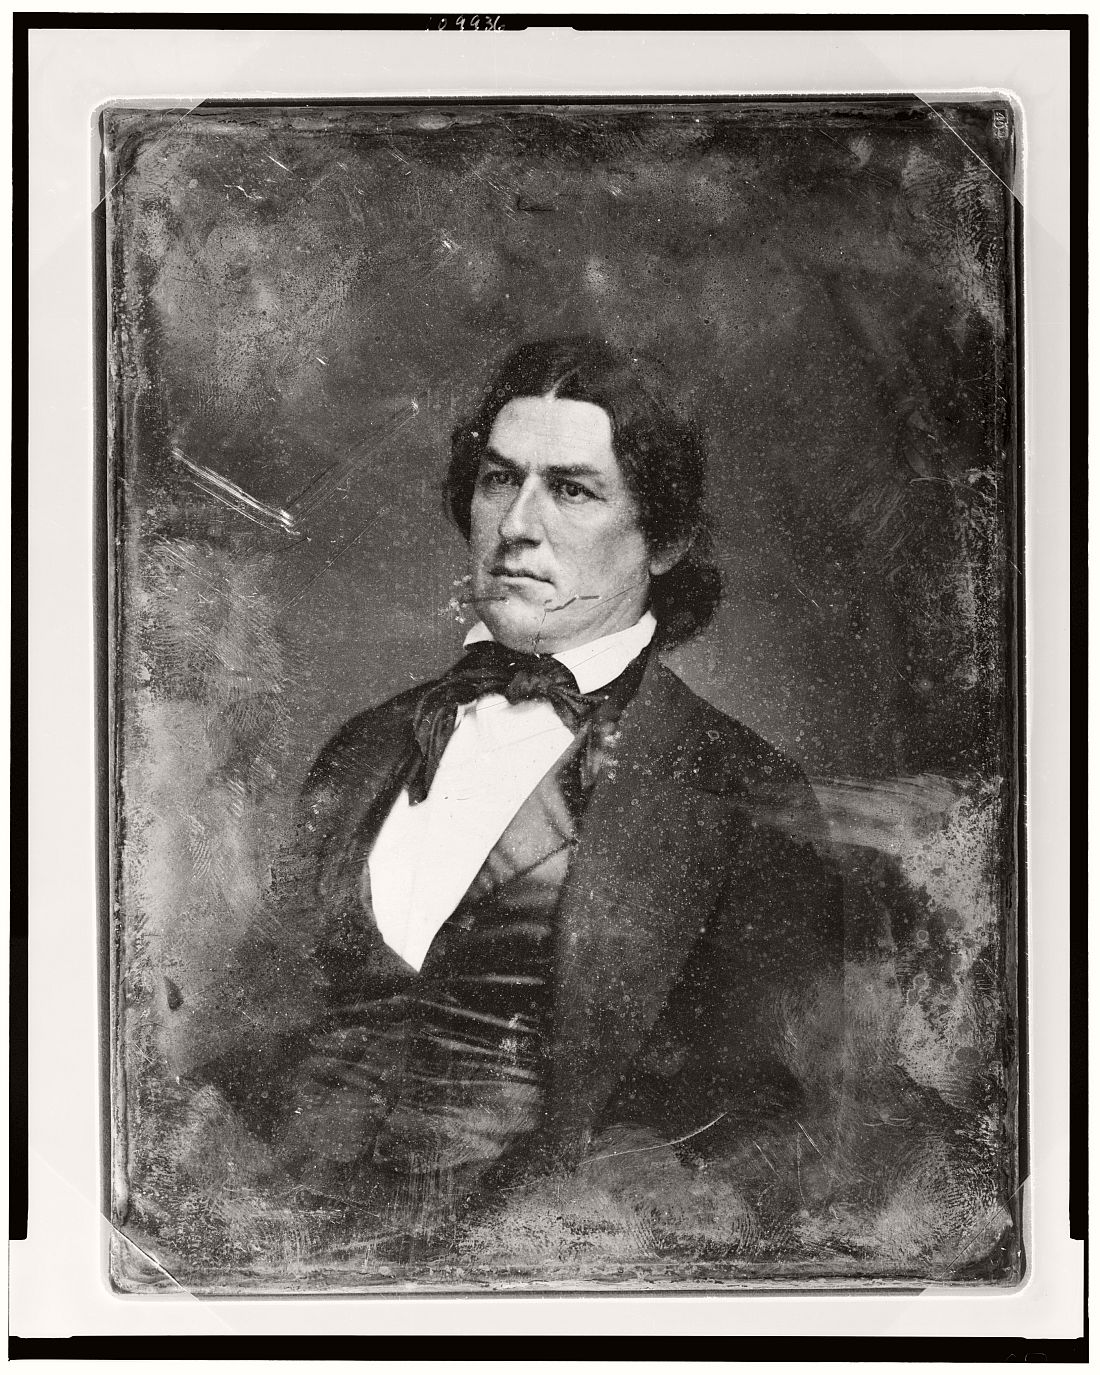 vintage-daguerreotype-portraits-from-xix-century-1844-1860-27